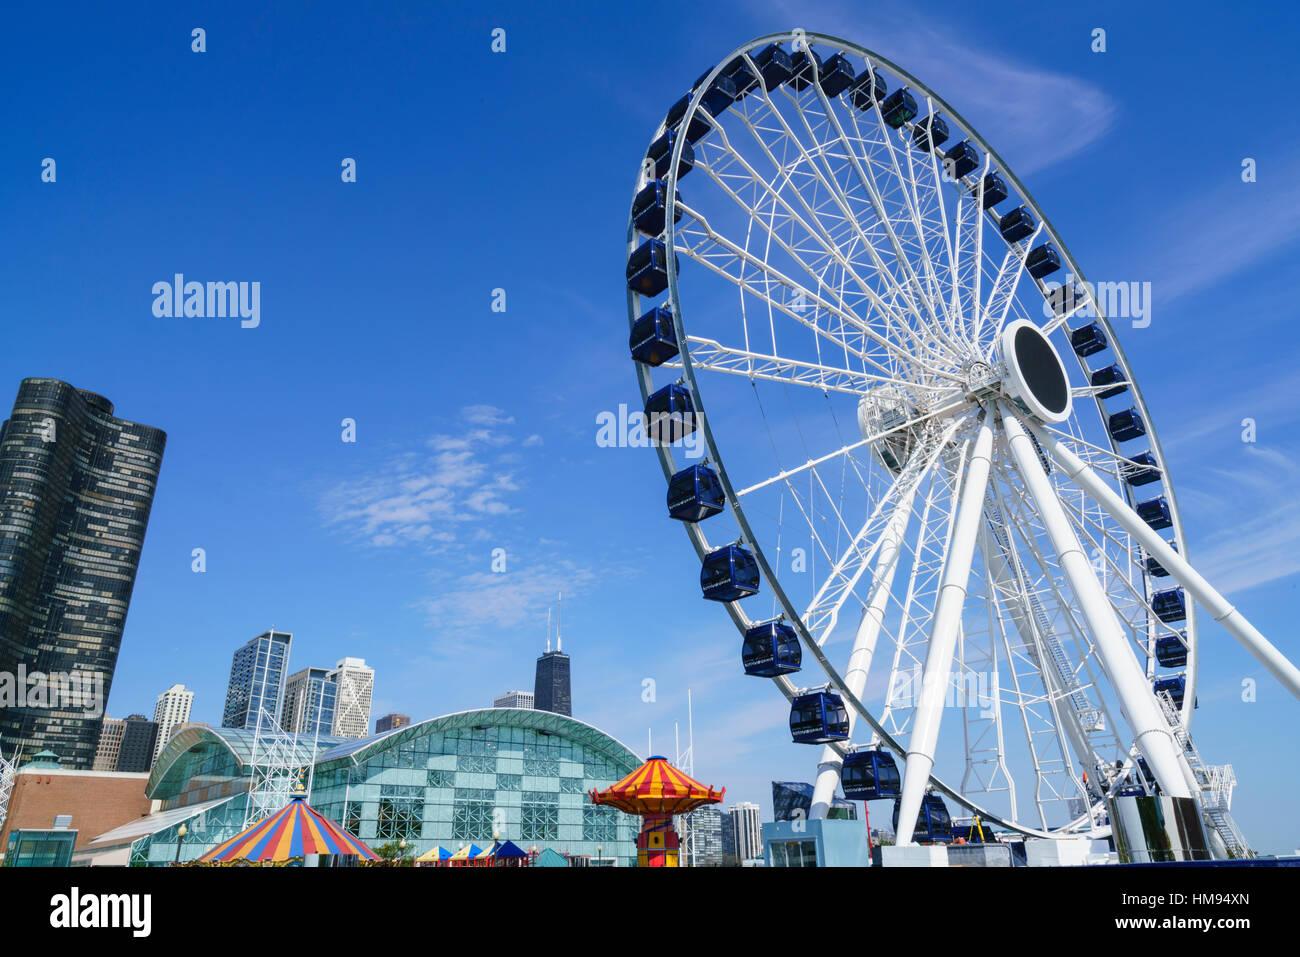 The ferris wheel on Navy Pier, Chicago, Illinois, United States of America, North America - Stock Image